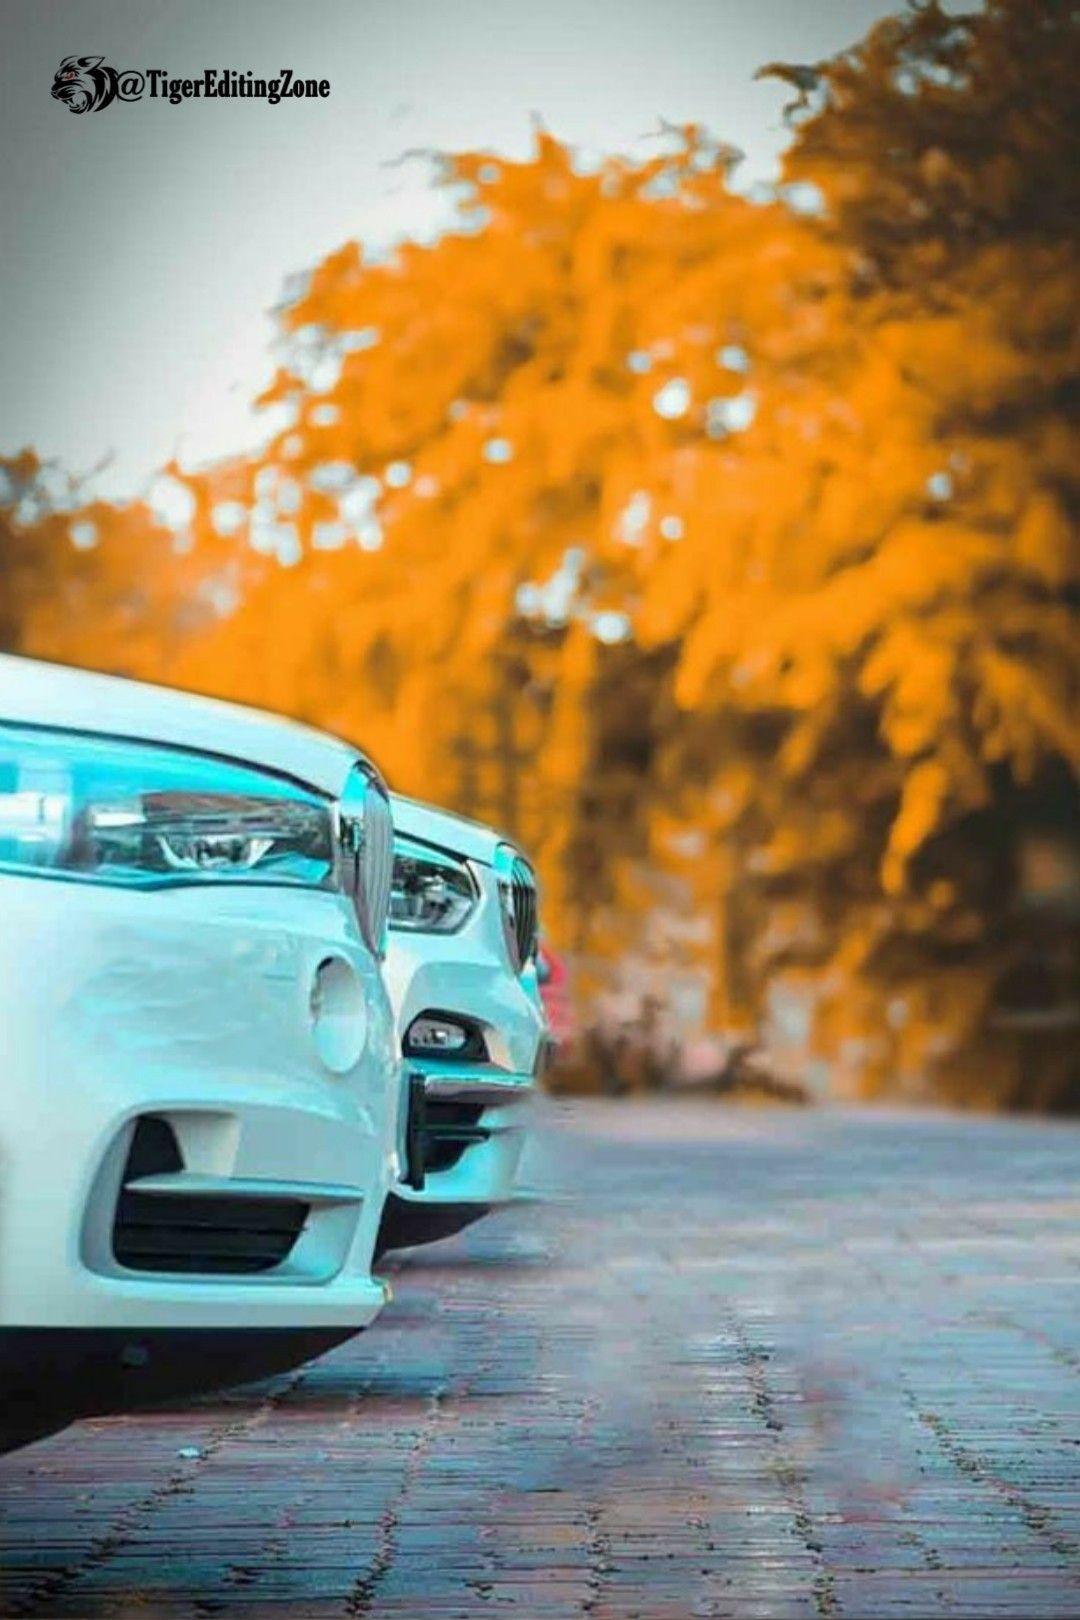 Colour Background Picsart Cb Car Background Hd